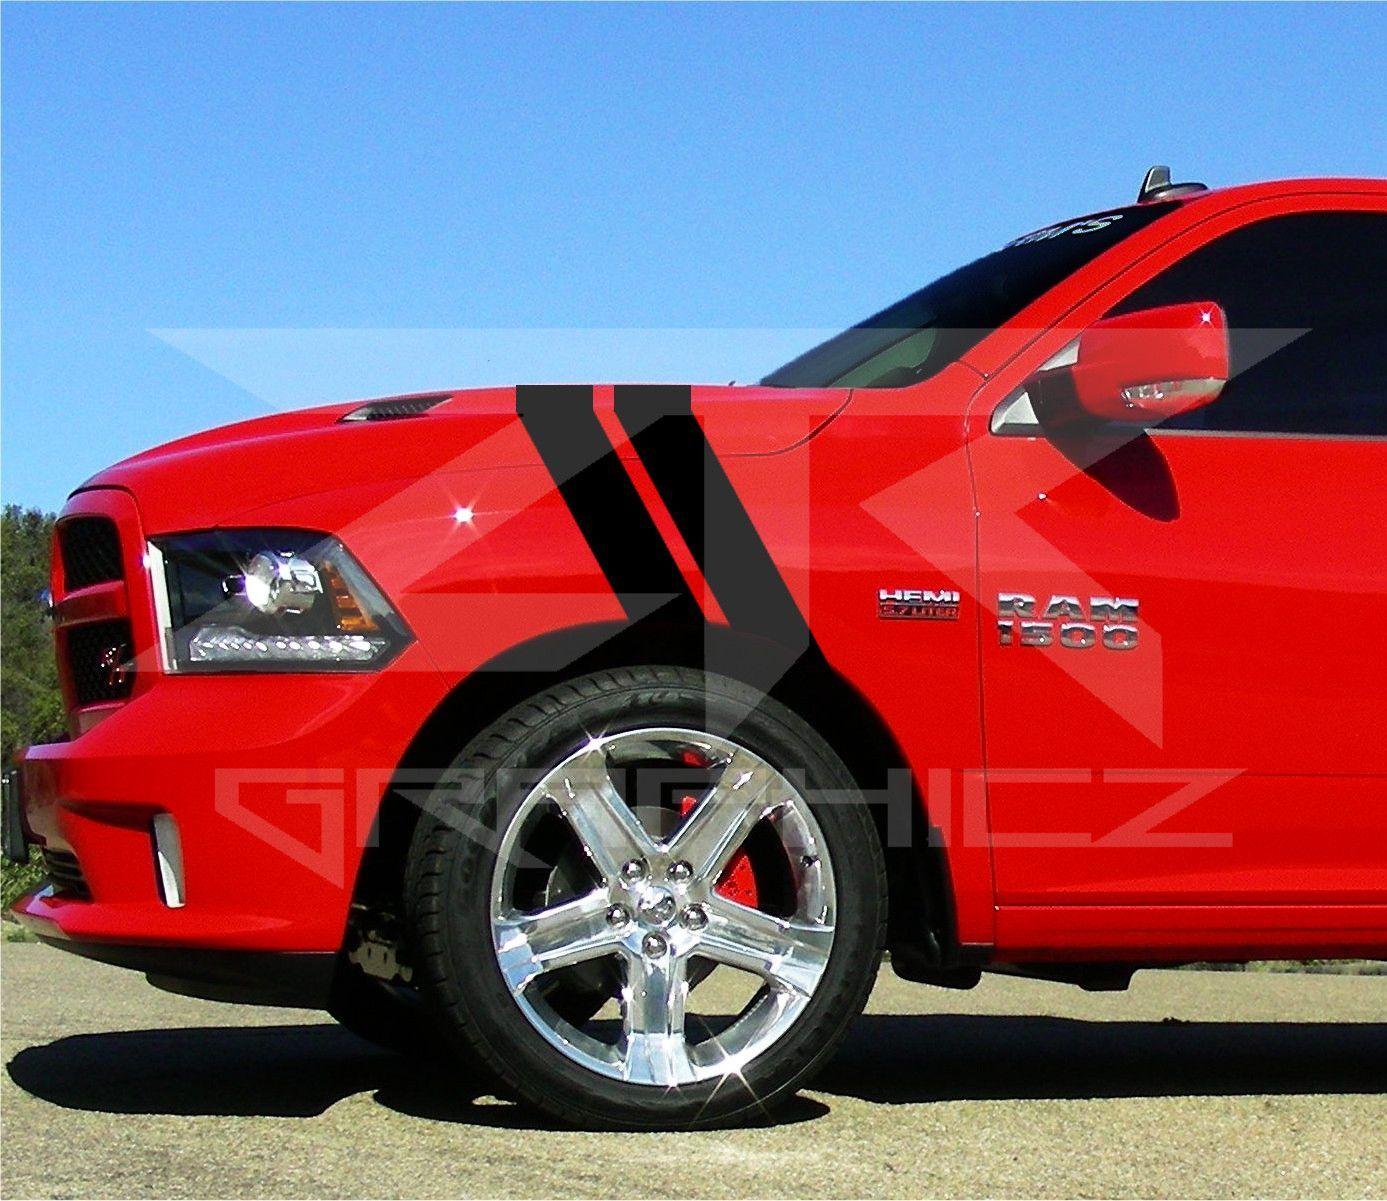 Dodge ram dual fender stripe hash mark rt 1500 stripe decal graphic kit